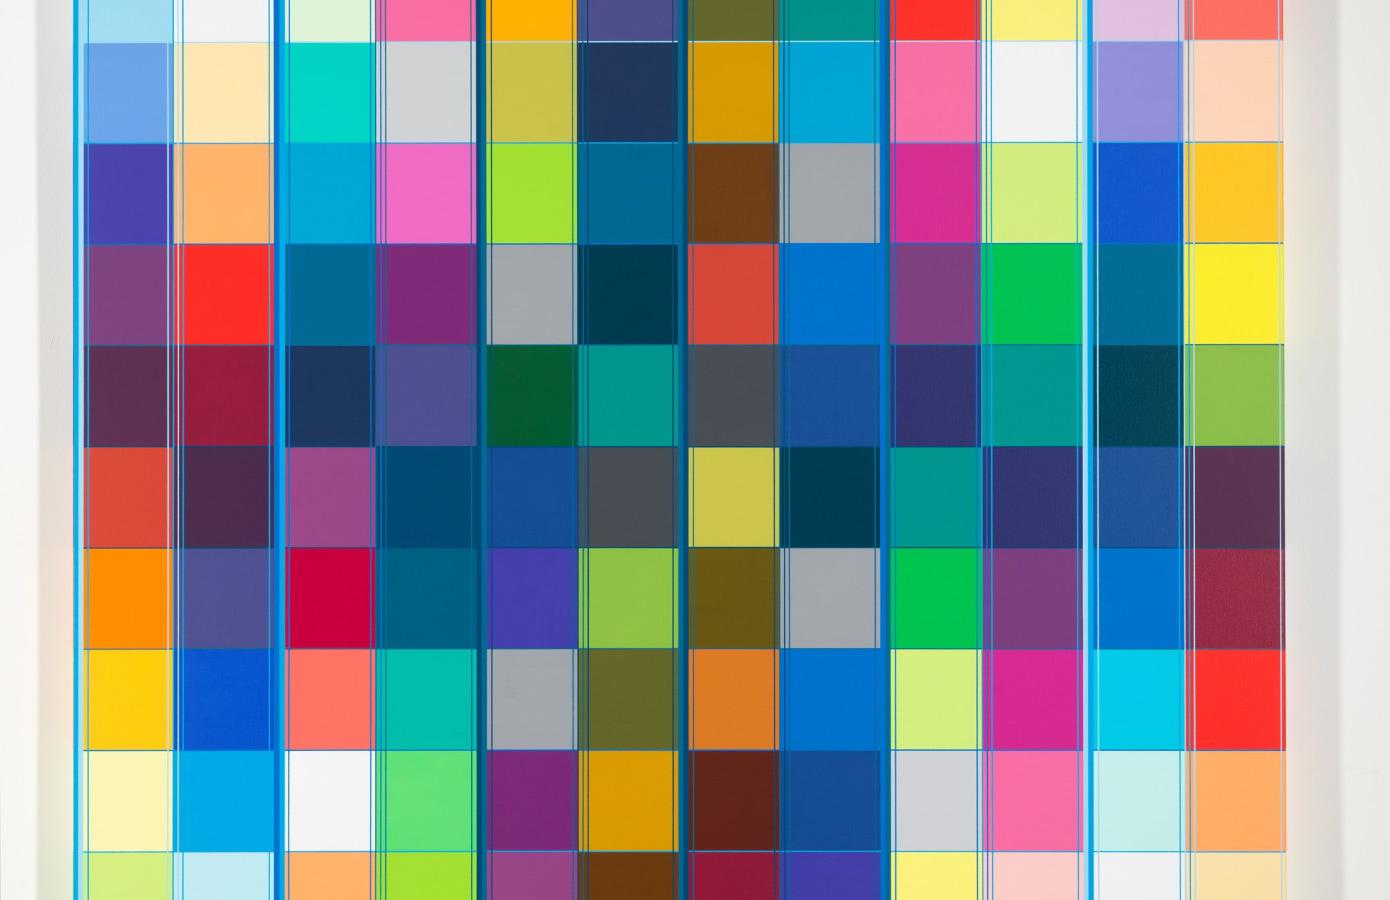 Art Rotterdam 2020, Cor van Dijk, Jus Juchtmans, Ditty Ketting, Ton van Kints, Harry Markusse, Dave Meijer, P.B. Van Rossem, Nanda Runge, Shawn Stipling, Clary Stolte,